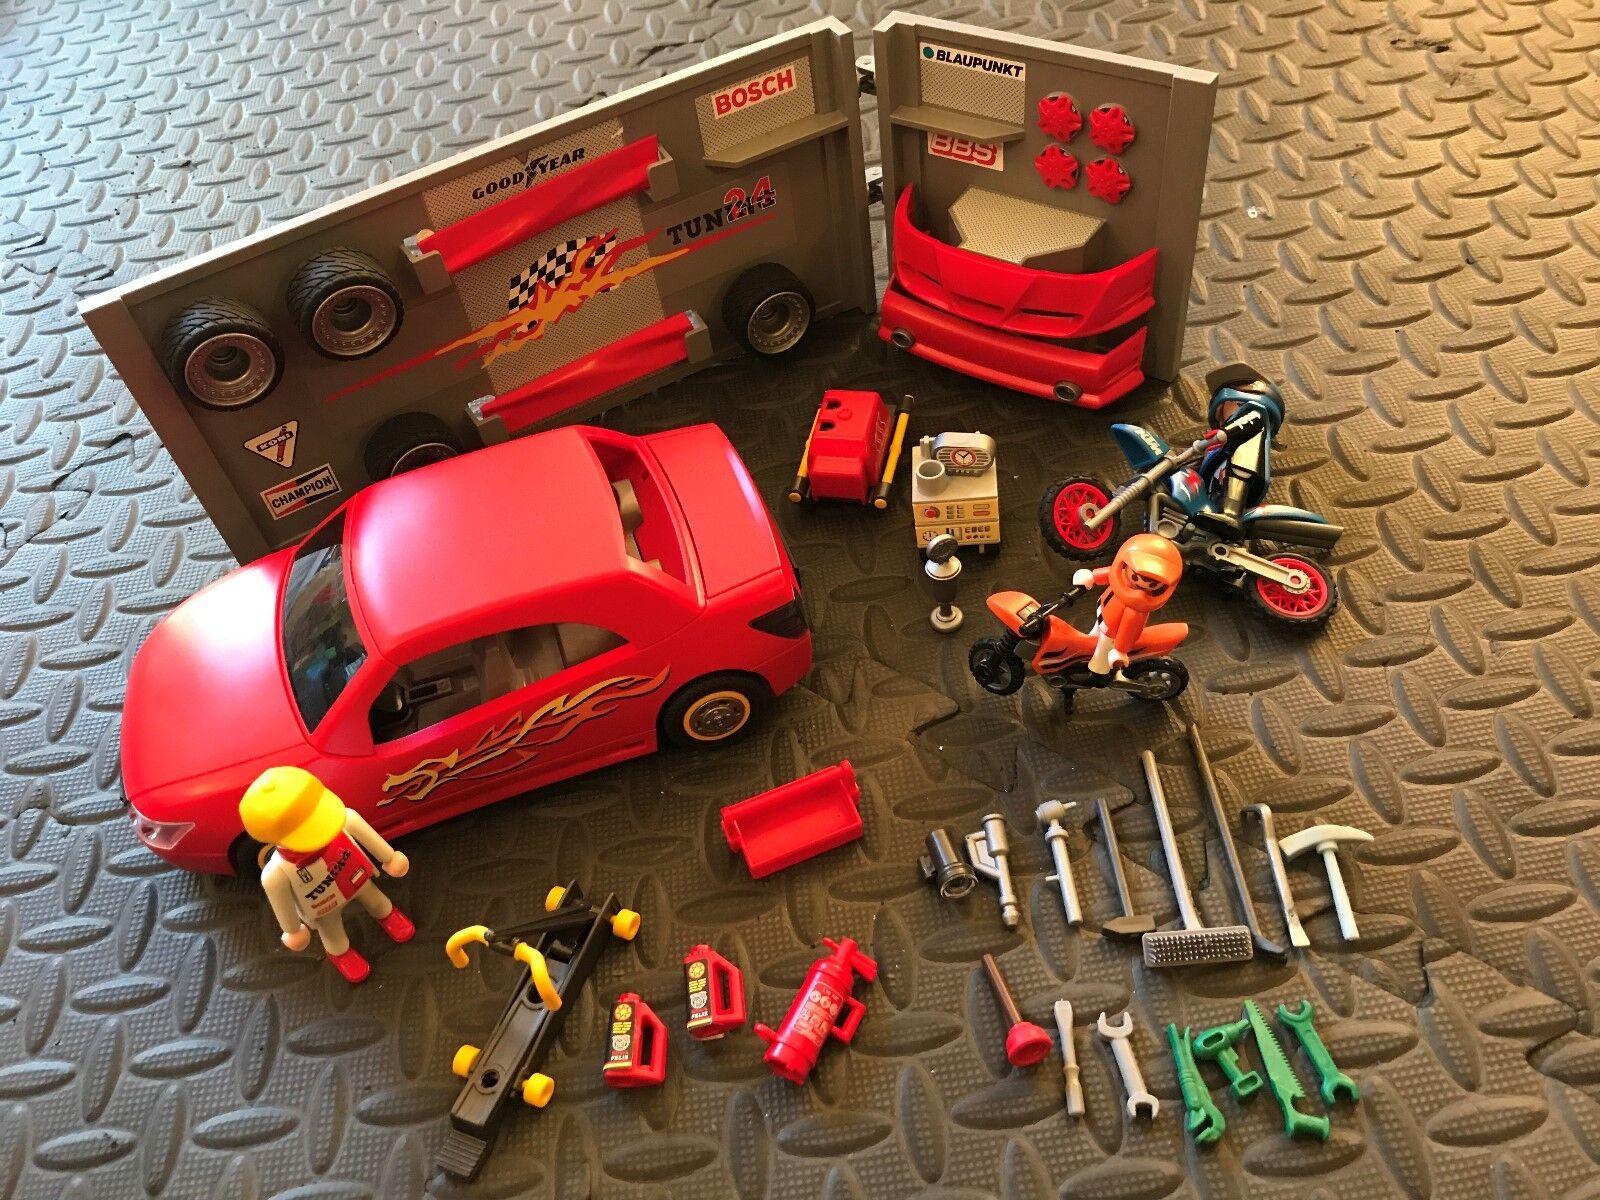 PLAYMOBIL Auto Officina Set RIF: 4321 + BOSCH/KTM & mini moto trials